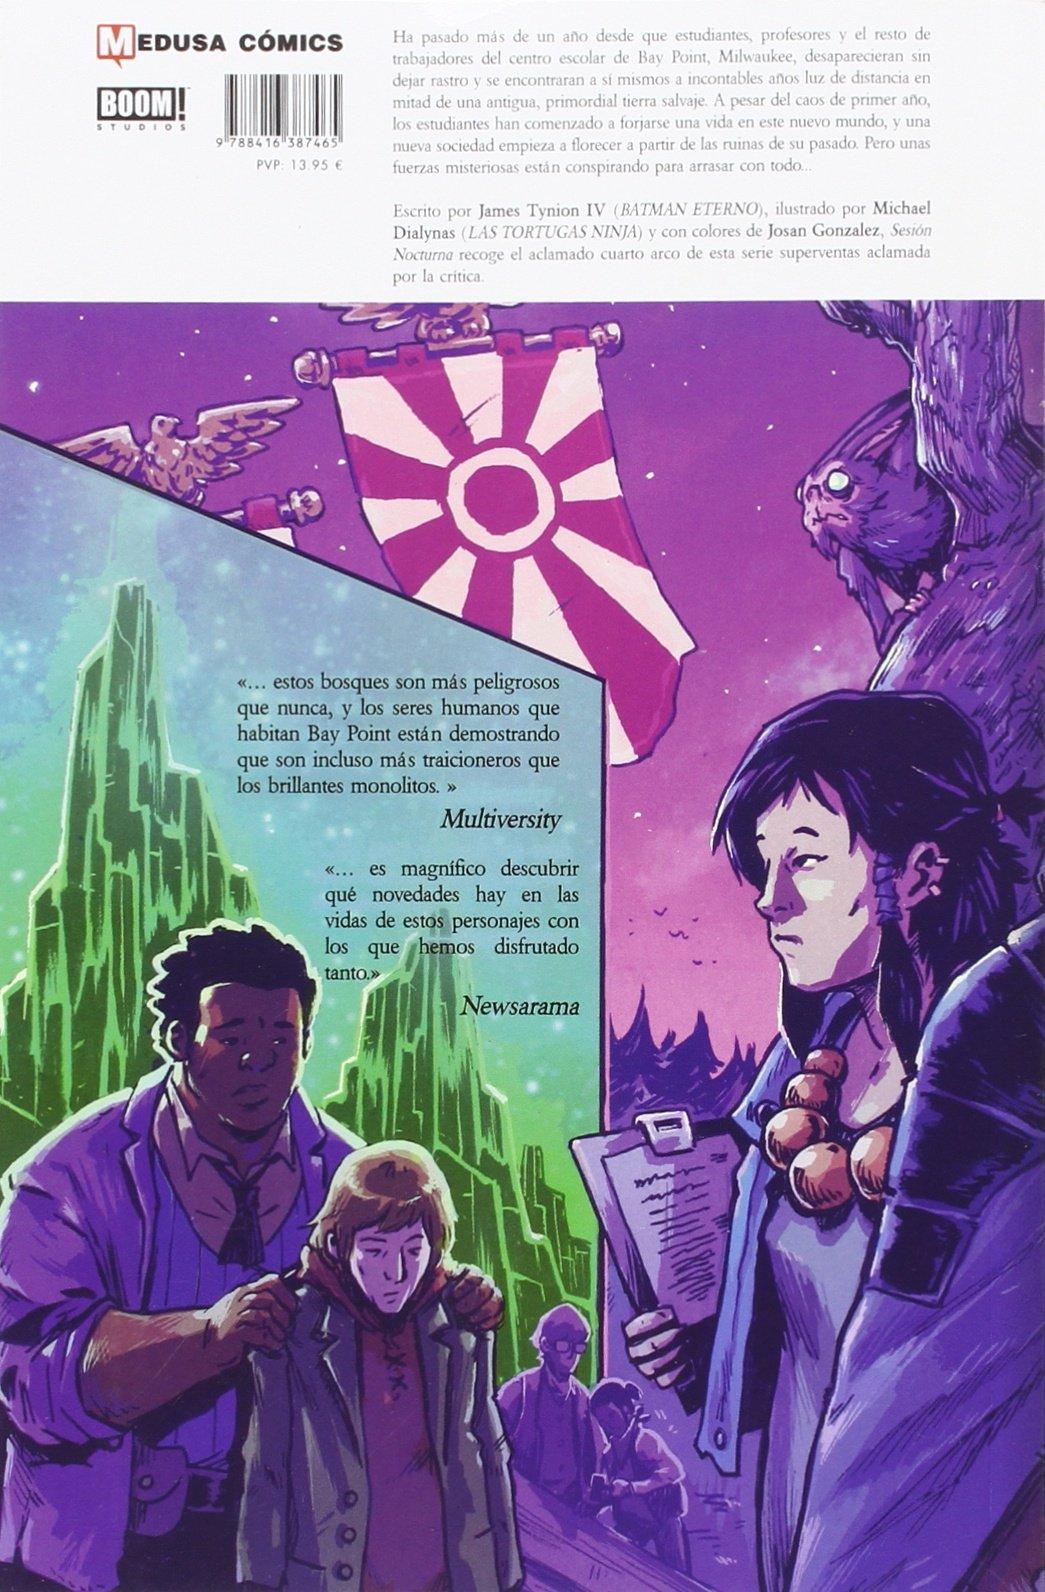 The Woods 4: Amazon.es: James Tynion IV, Michael Dialynas ...